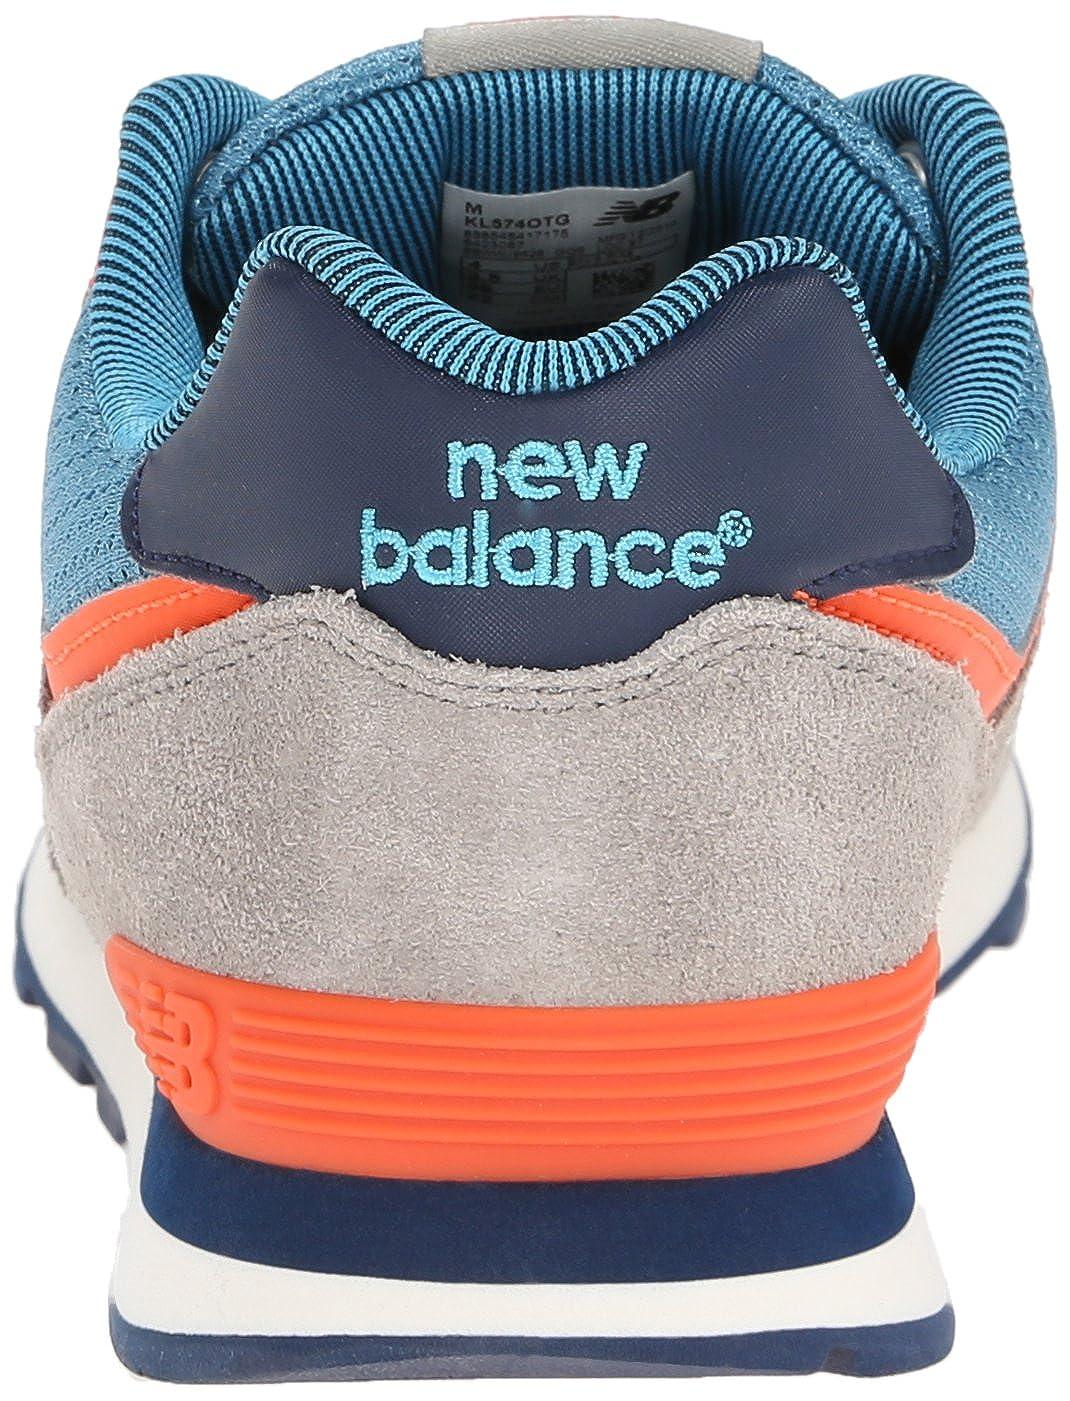 New Balance KL574OTG   KL574OTG - c81a82